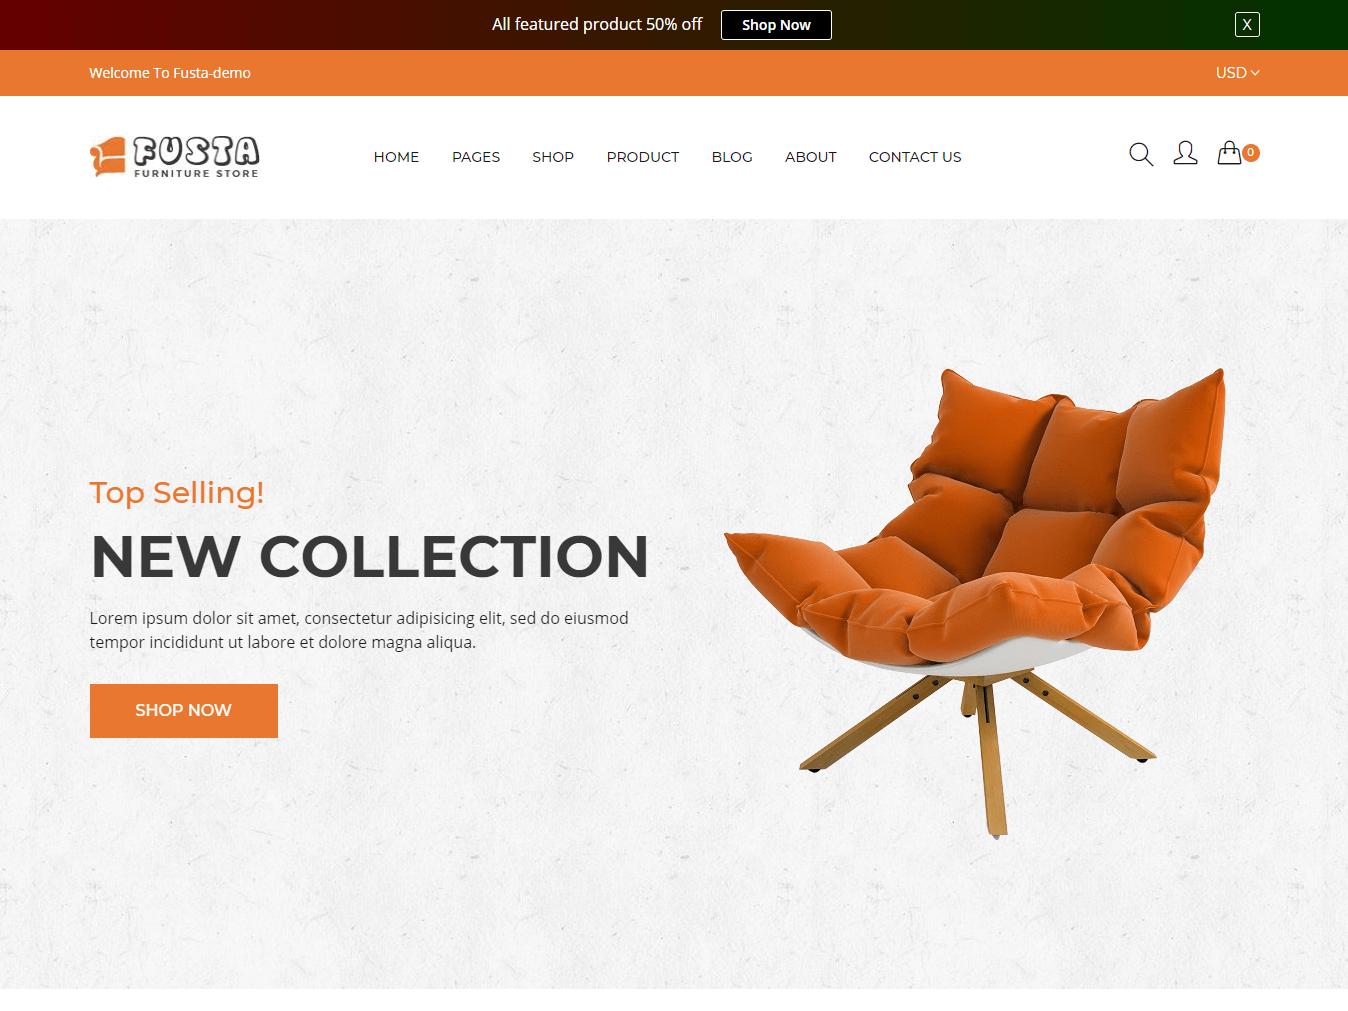 Fusta - Furniture eCommerce Bootstrap 4 Template